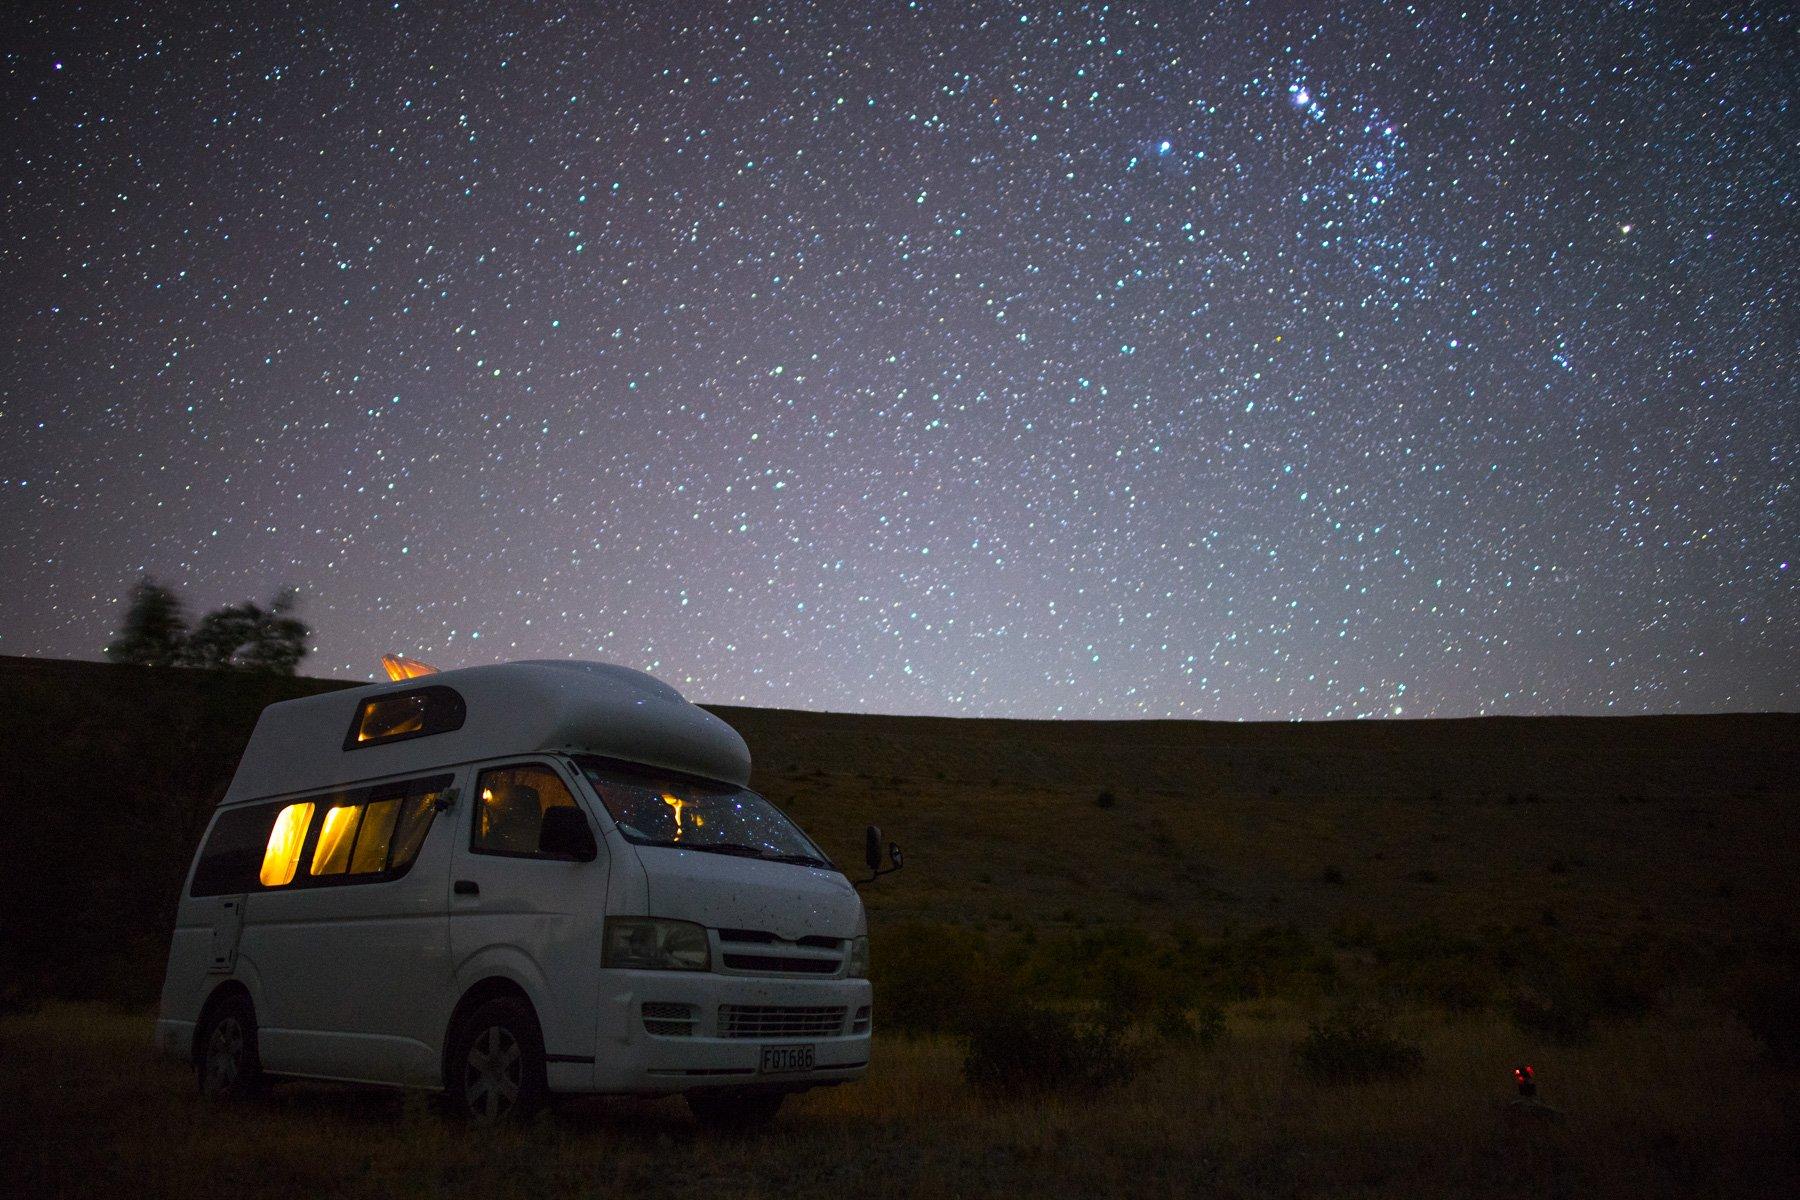 Toyota-Hiace-Camper-night-sky-stars-newzealand